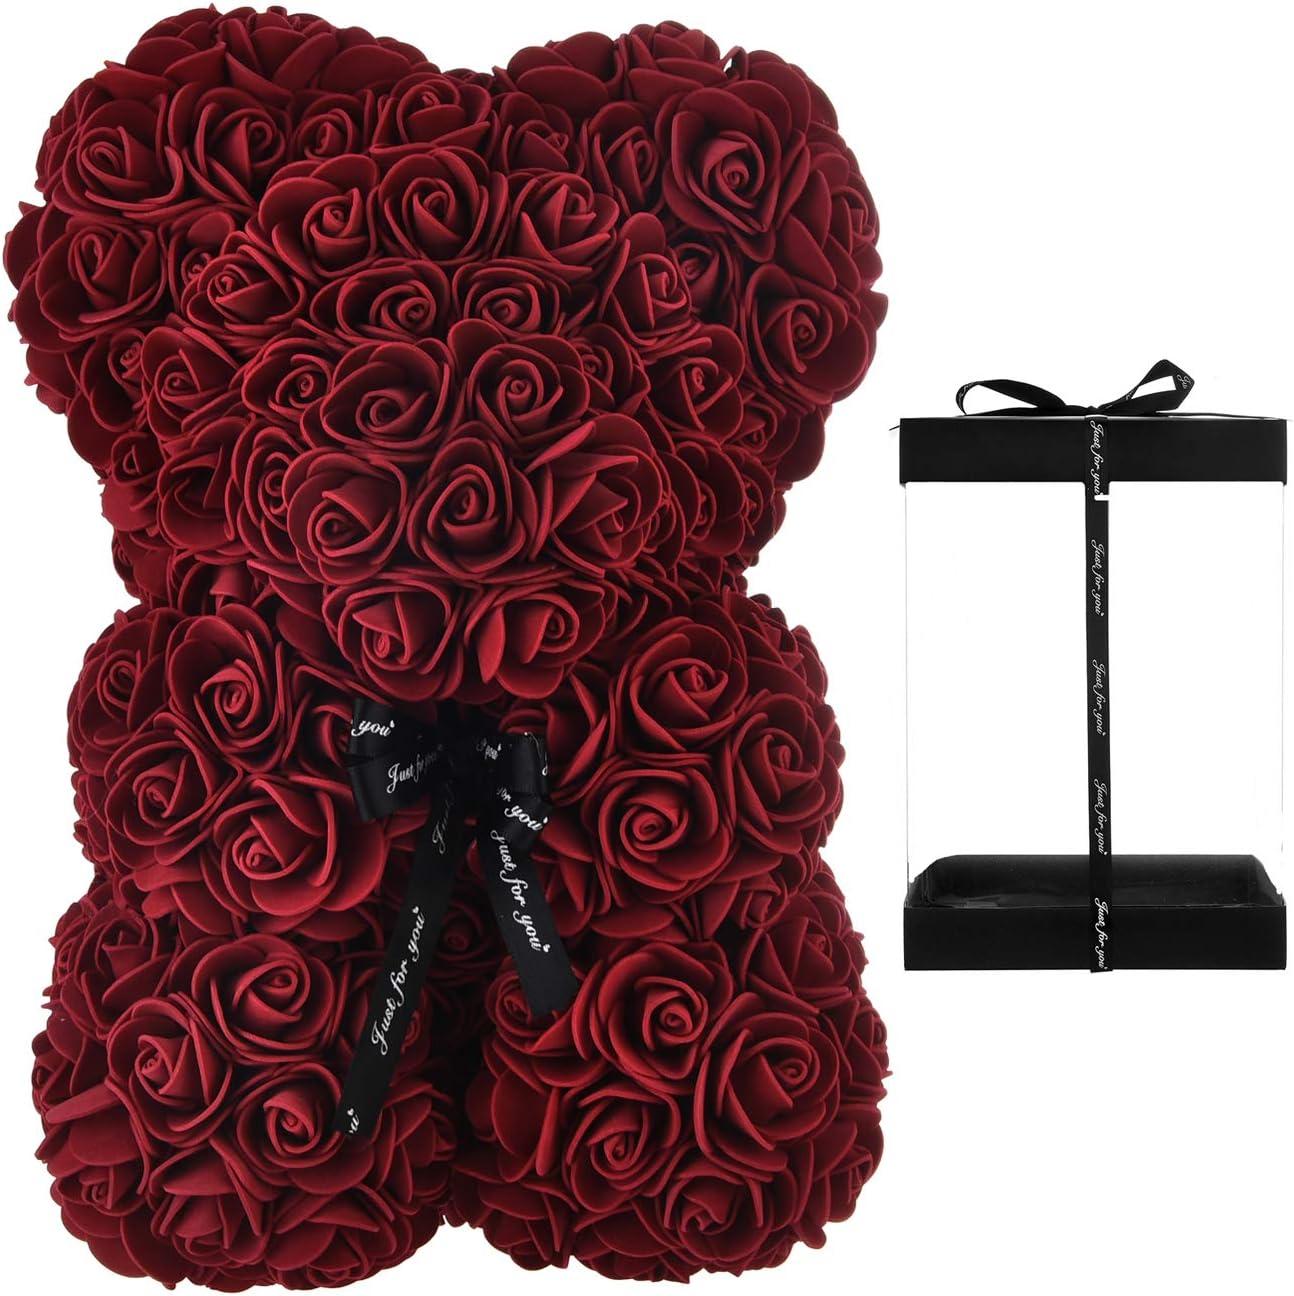 Rose Bear - Rose Teddy Bear 10 inch Hugz Teddy Flower Bear - Over 250 Dozen Artificial Flowers - Valentines Day, Anniversary & Bridal Showers Clear Gift Box (Burgundy)